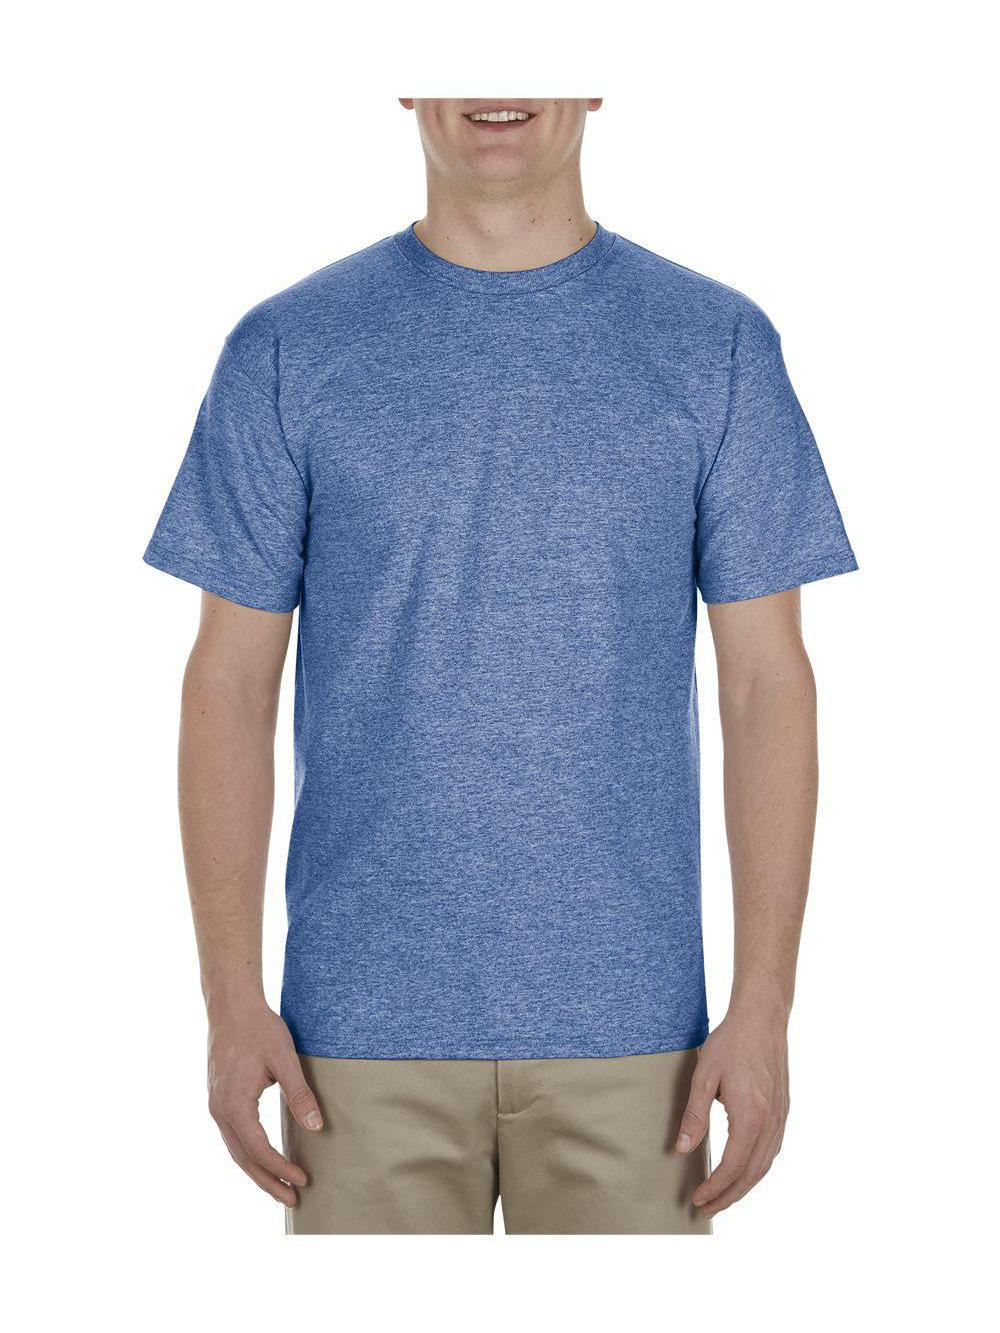 ALSTYLE-Premium-T-Shirt-1701 thumbnail 52